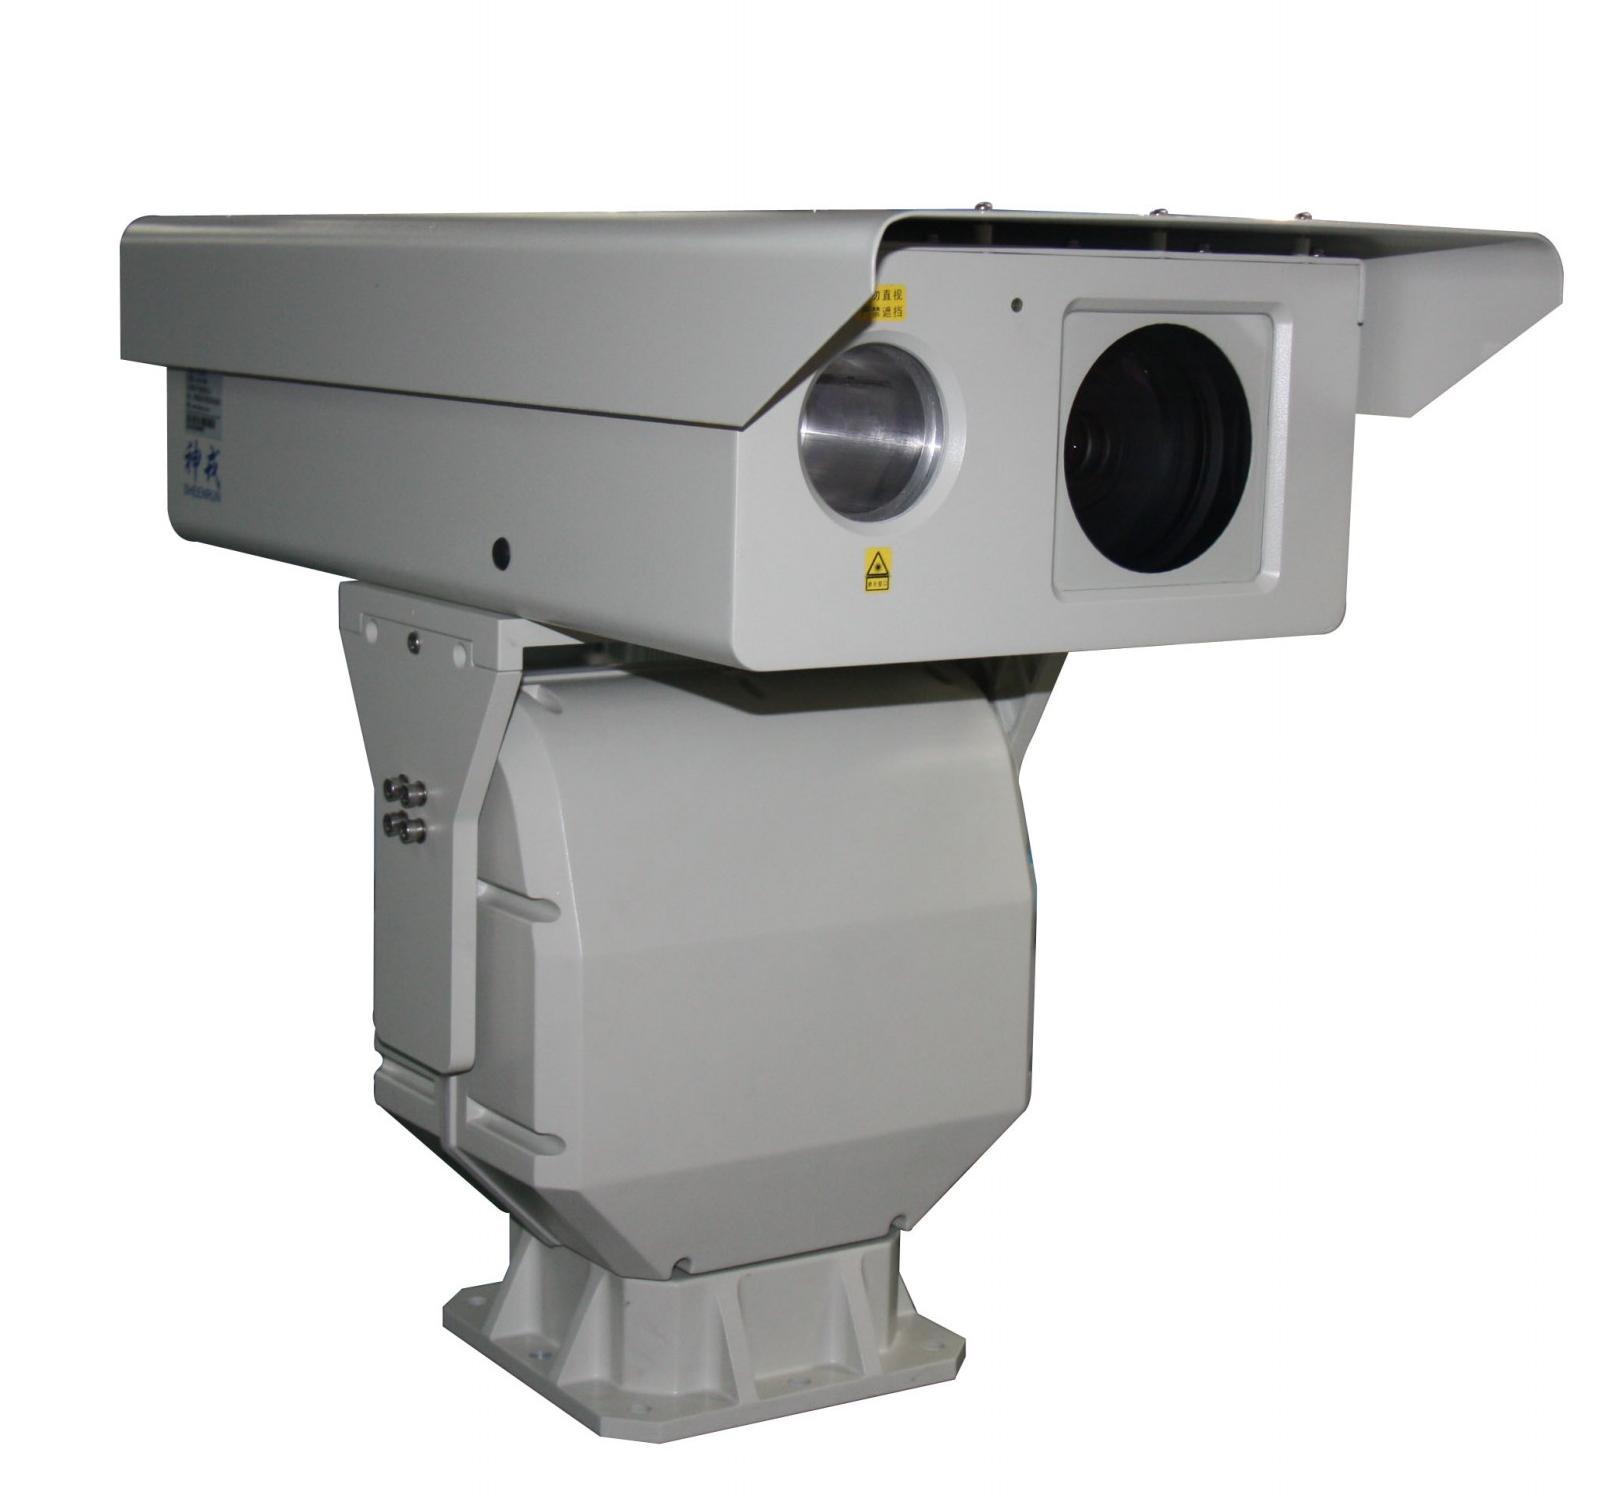 LV3000 Long Range Night Vision Camera